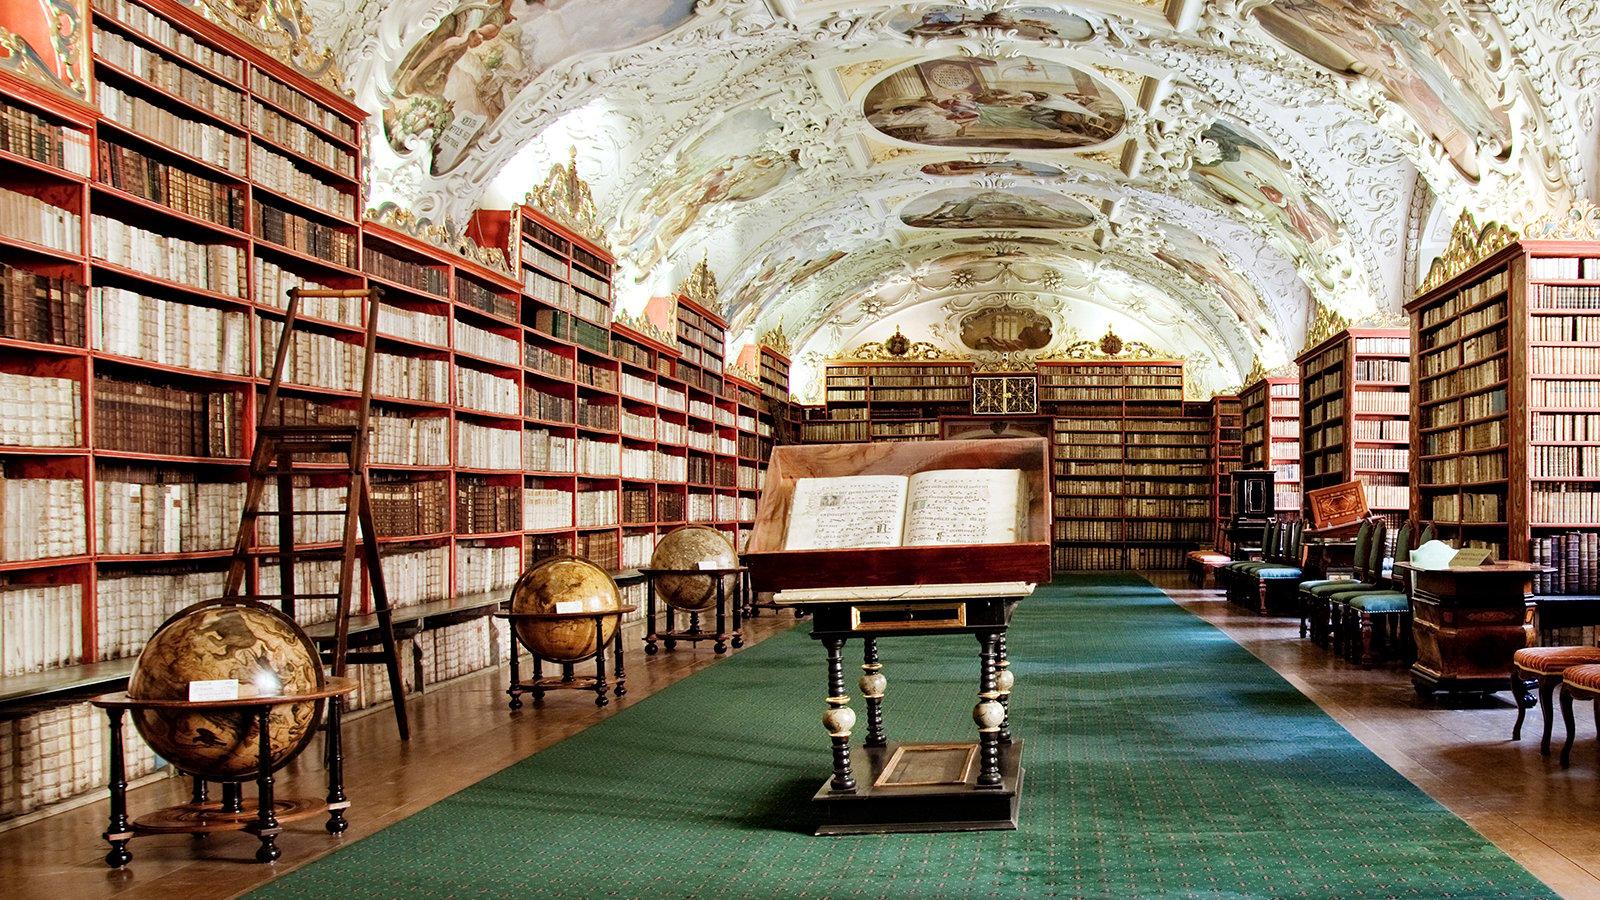 Renaissance Library. (iStock)